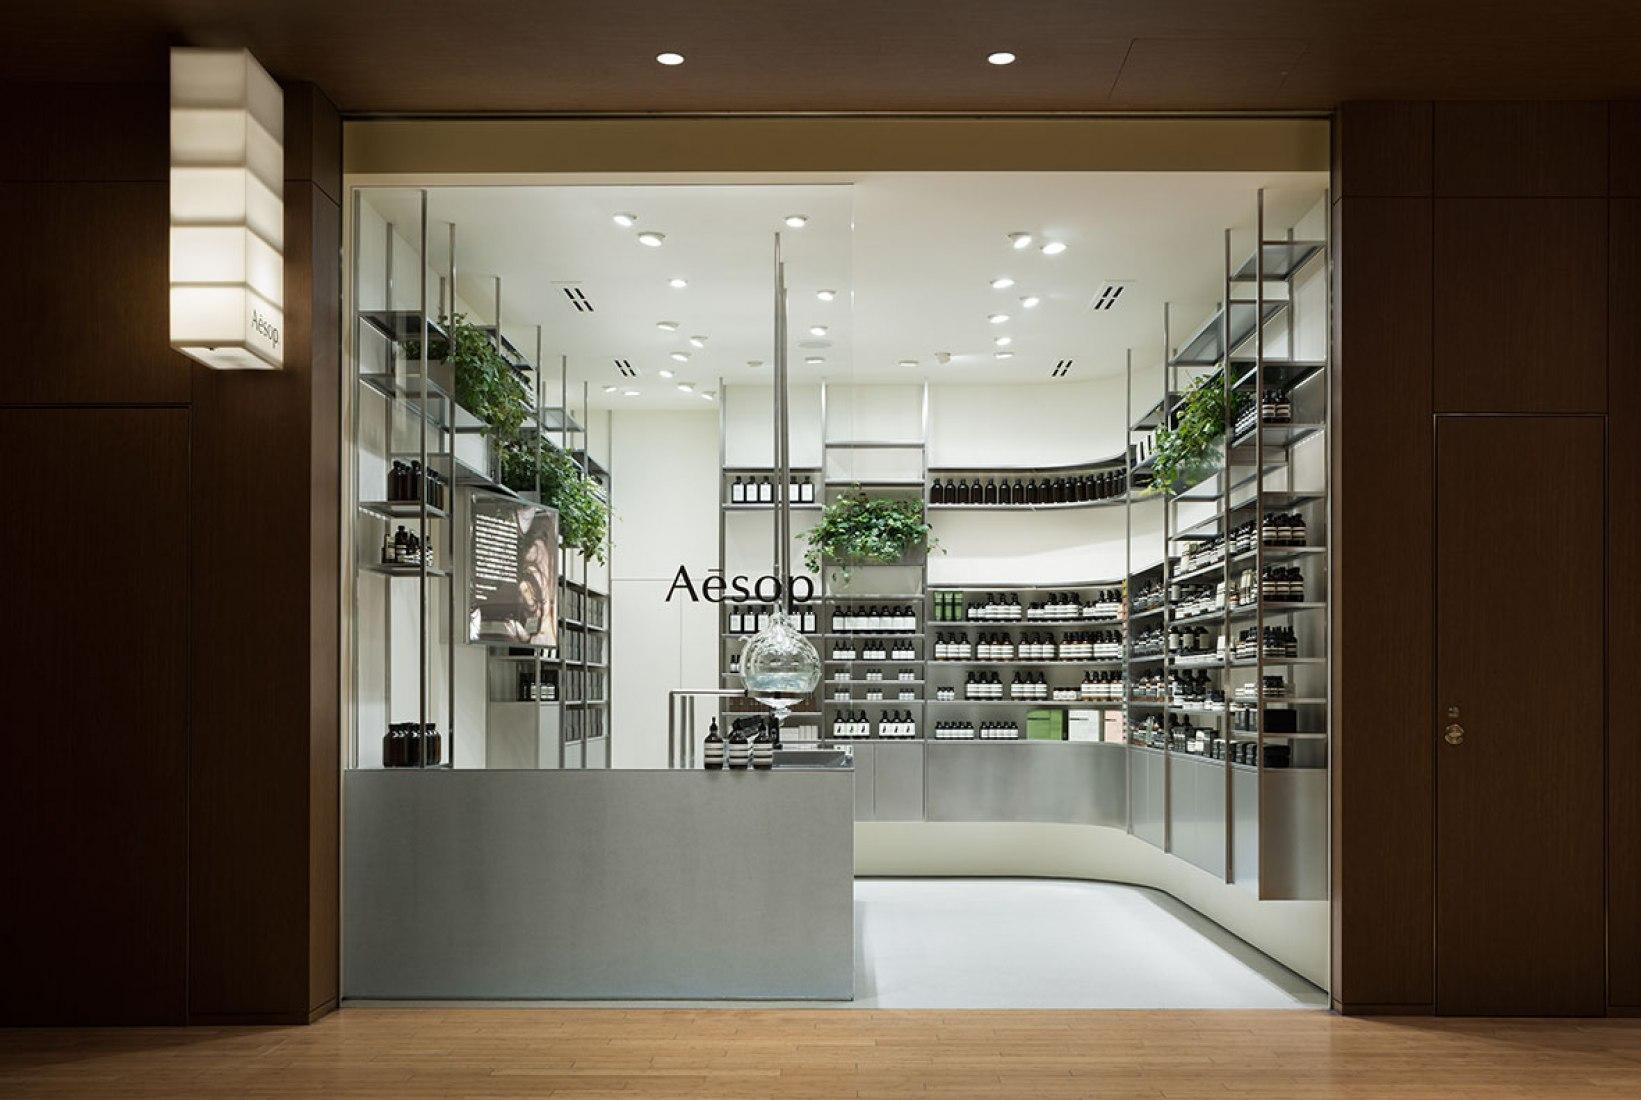 Aesop Midtown by Torafu Architects. Photograph © Takumi Ota.